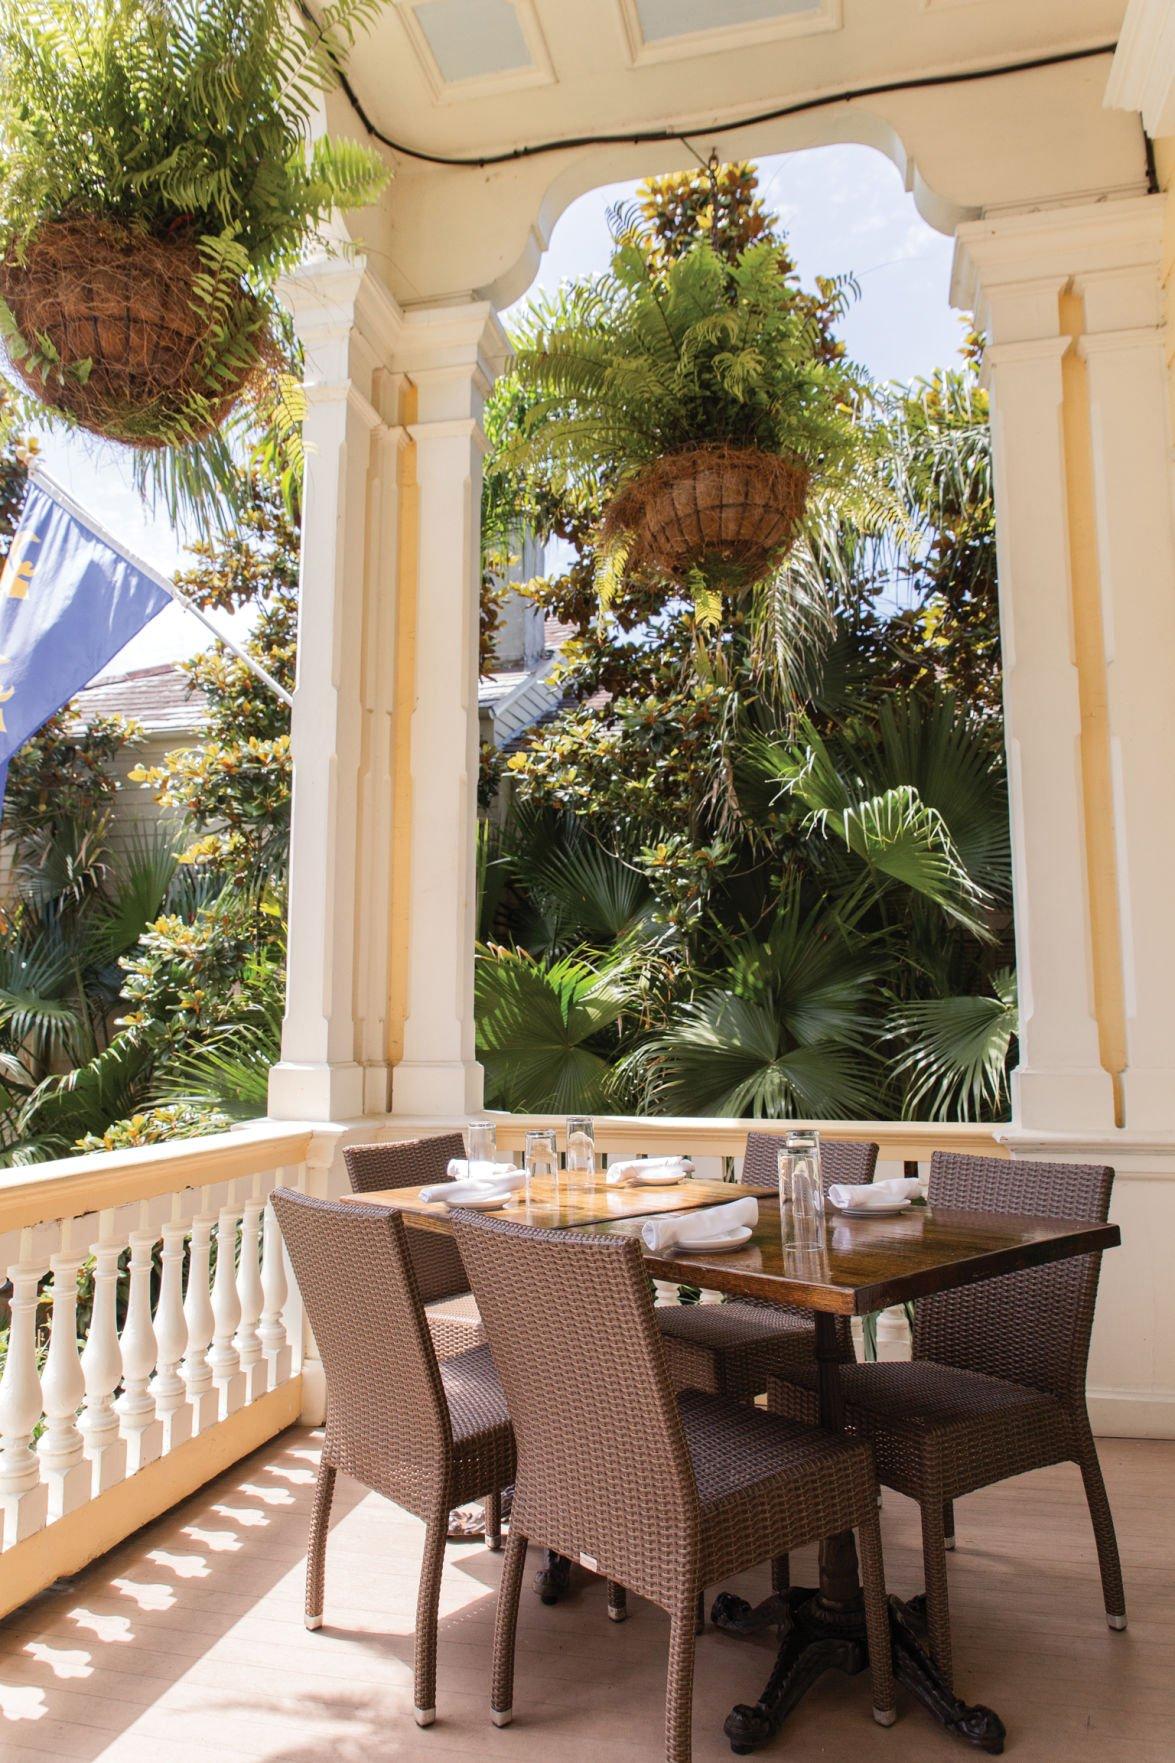 Country Club_corner table porch.jpg